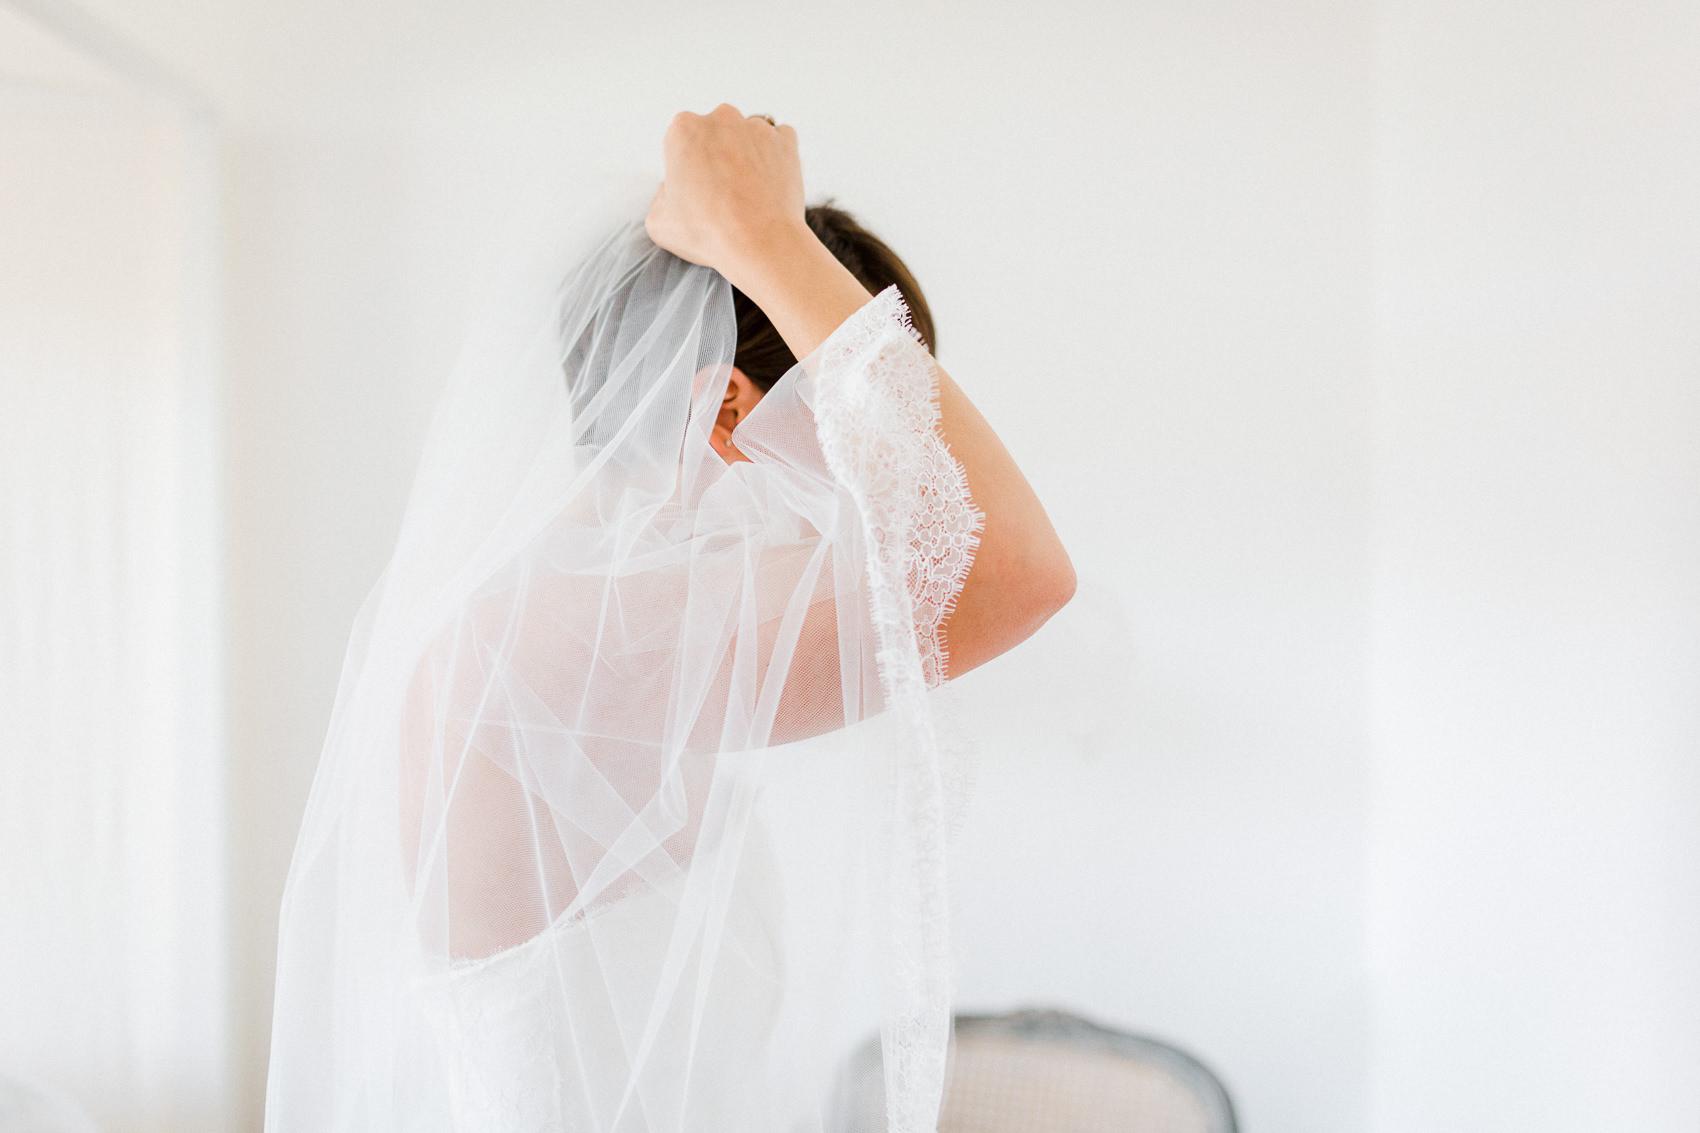 mariage-charlotte-et-joel-trendzphotography-035